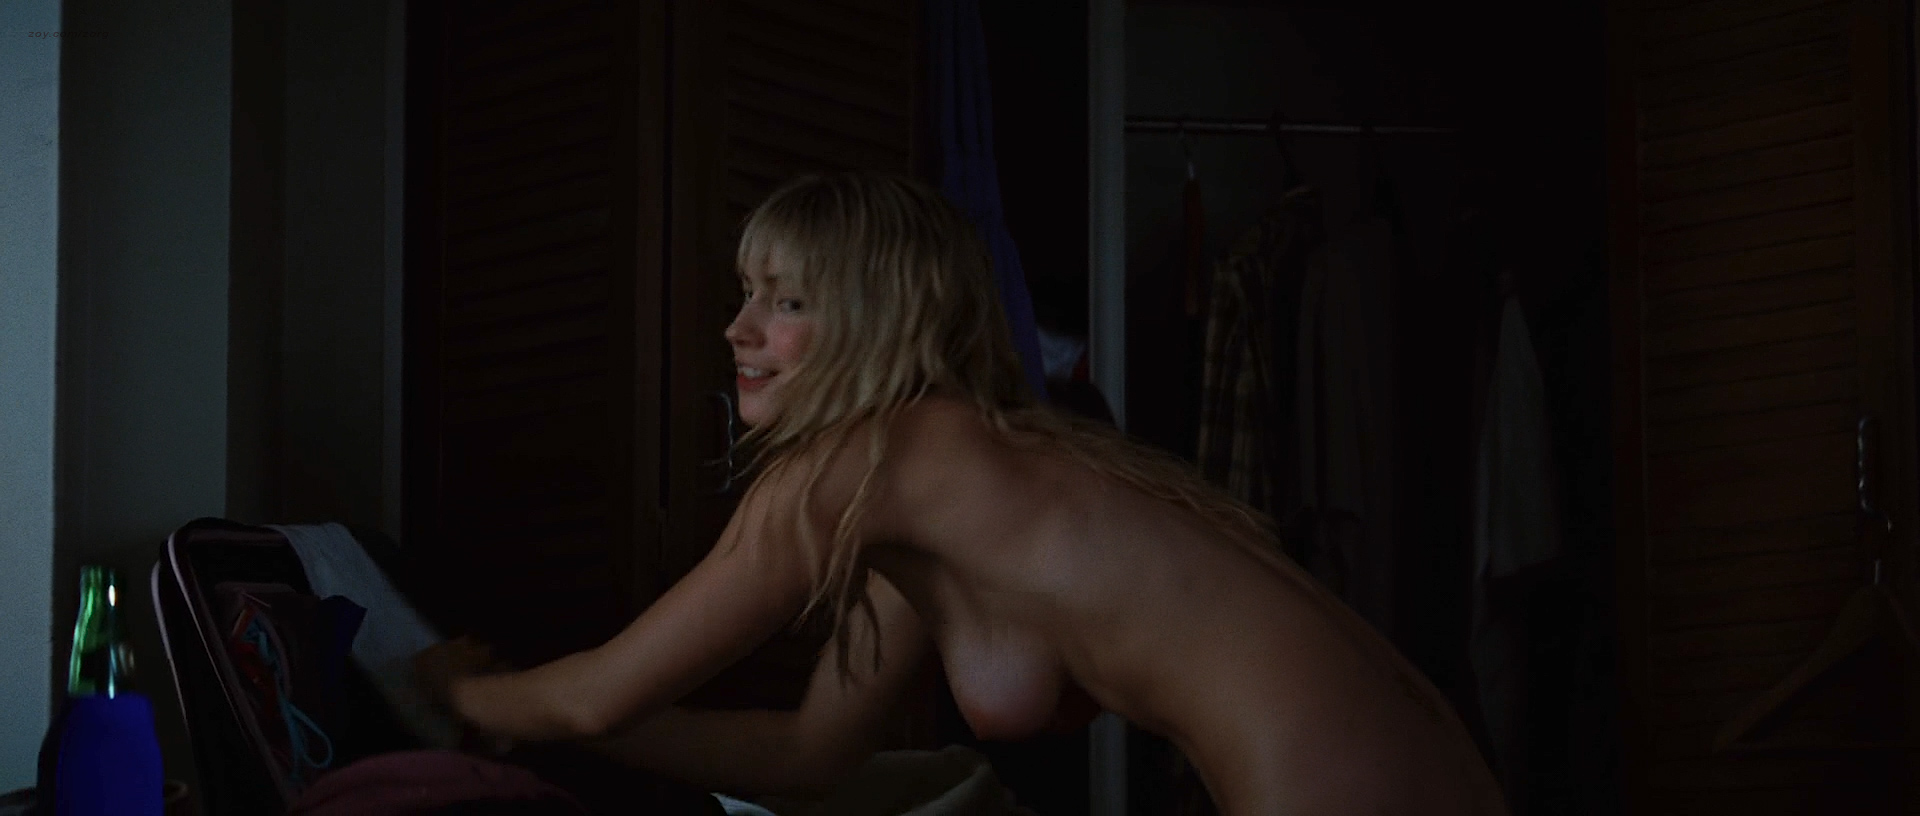 Barrett long nude